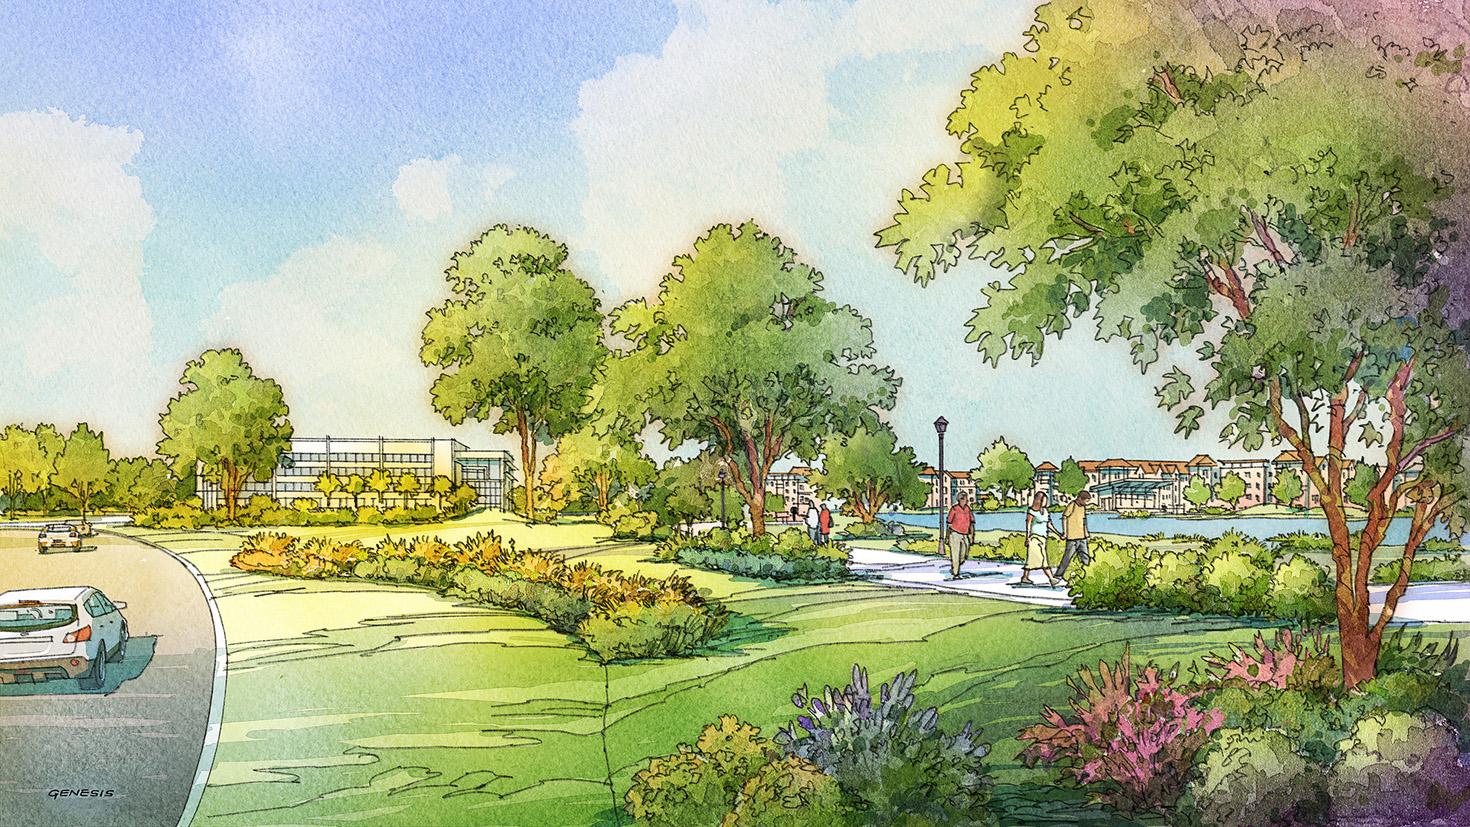 616030- Digital Watercolor Architectural Renderings of Gate Parkway Park for CallisonRTKL